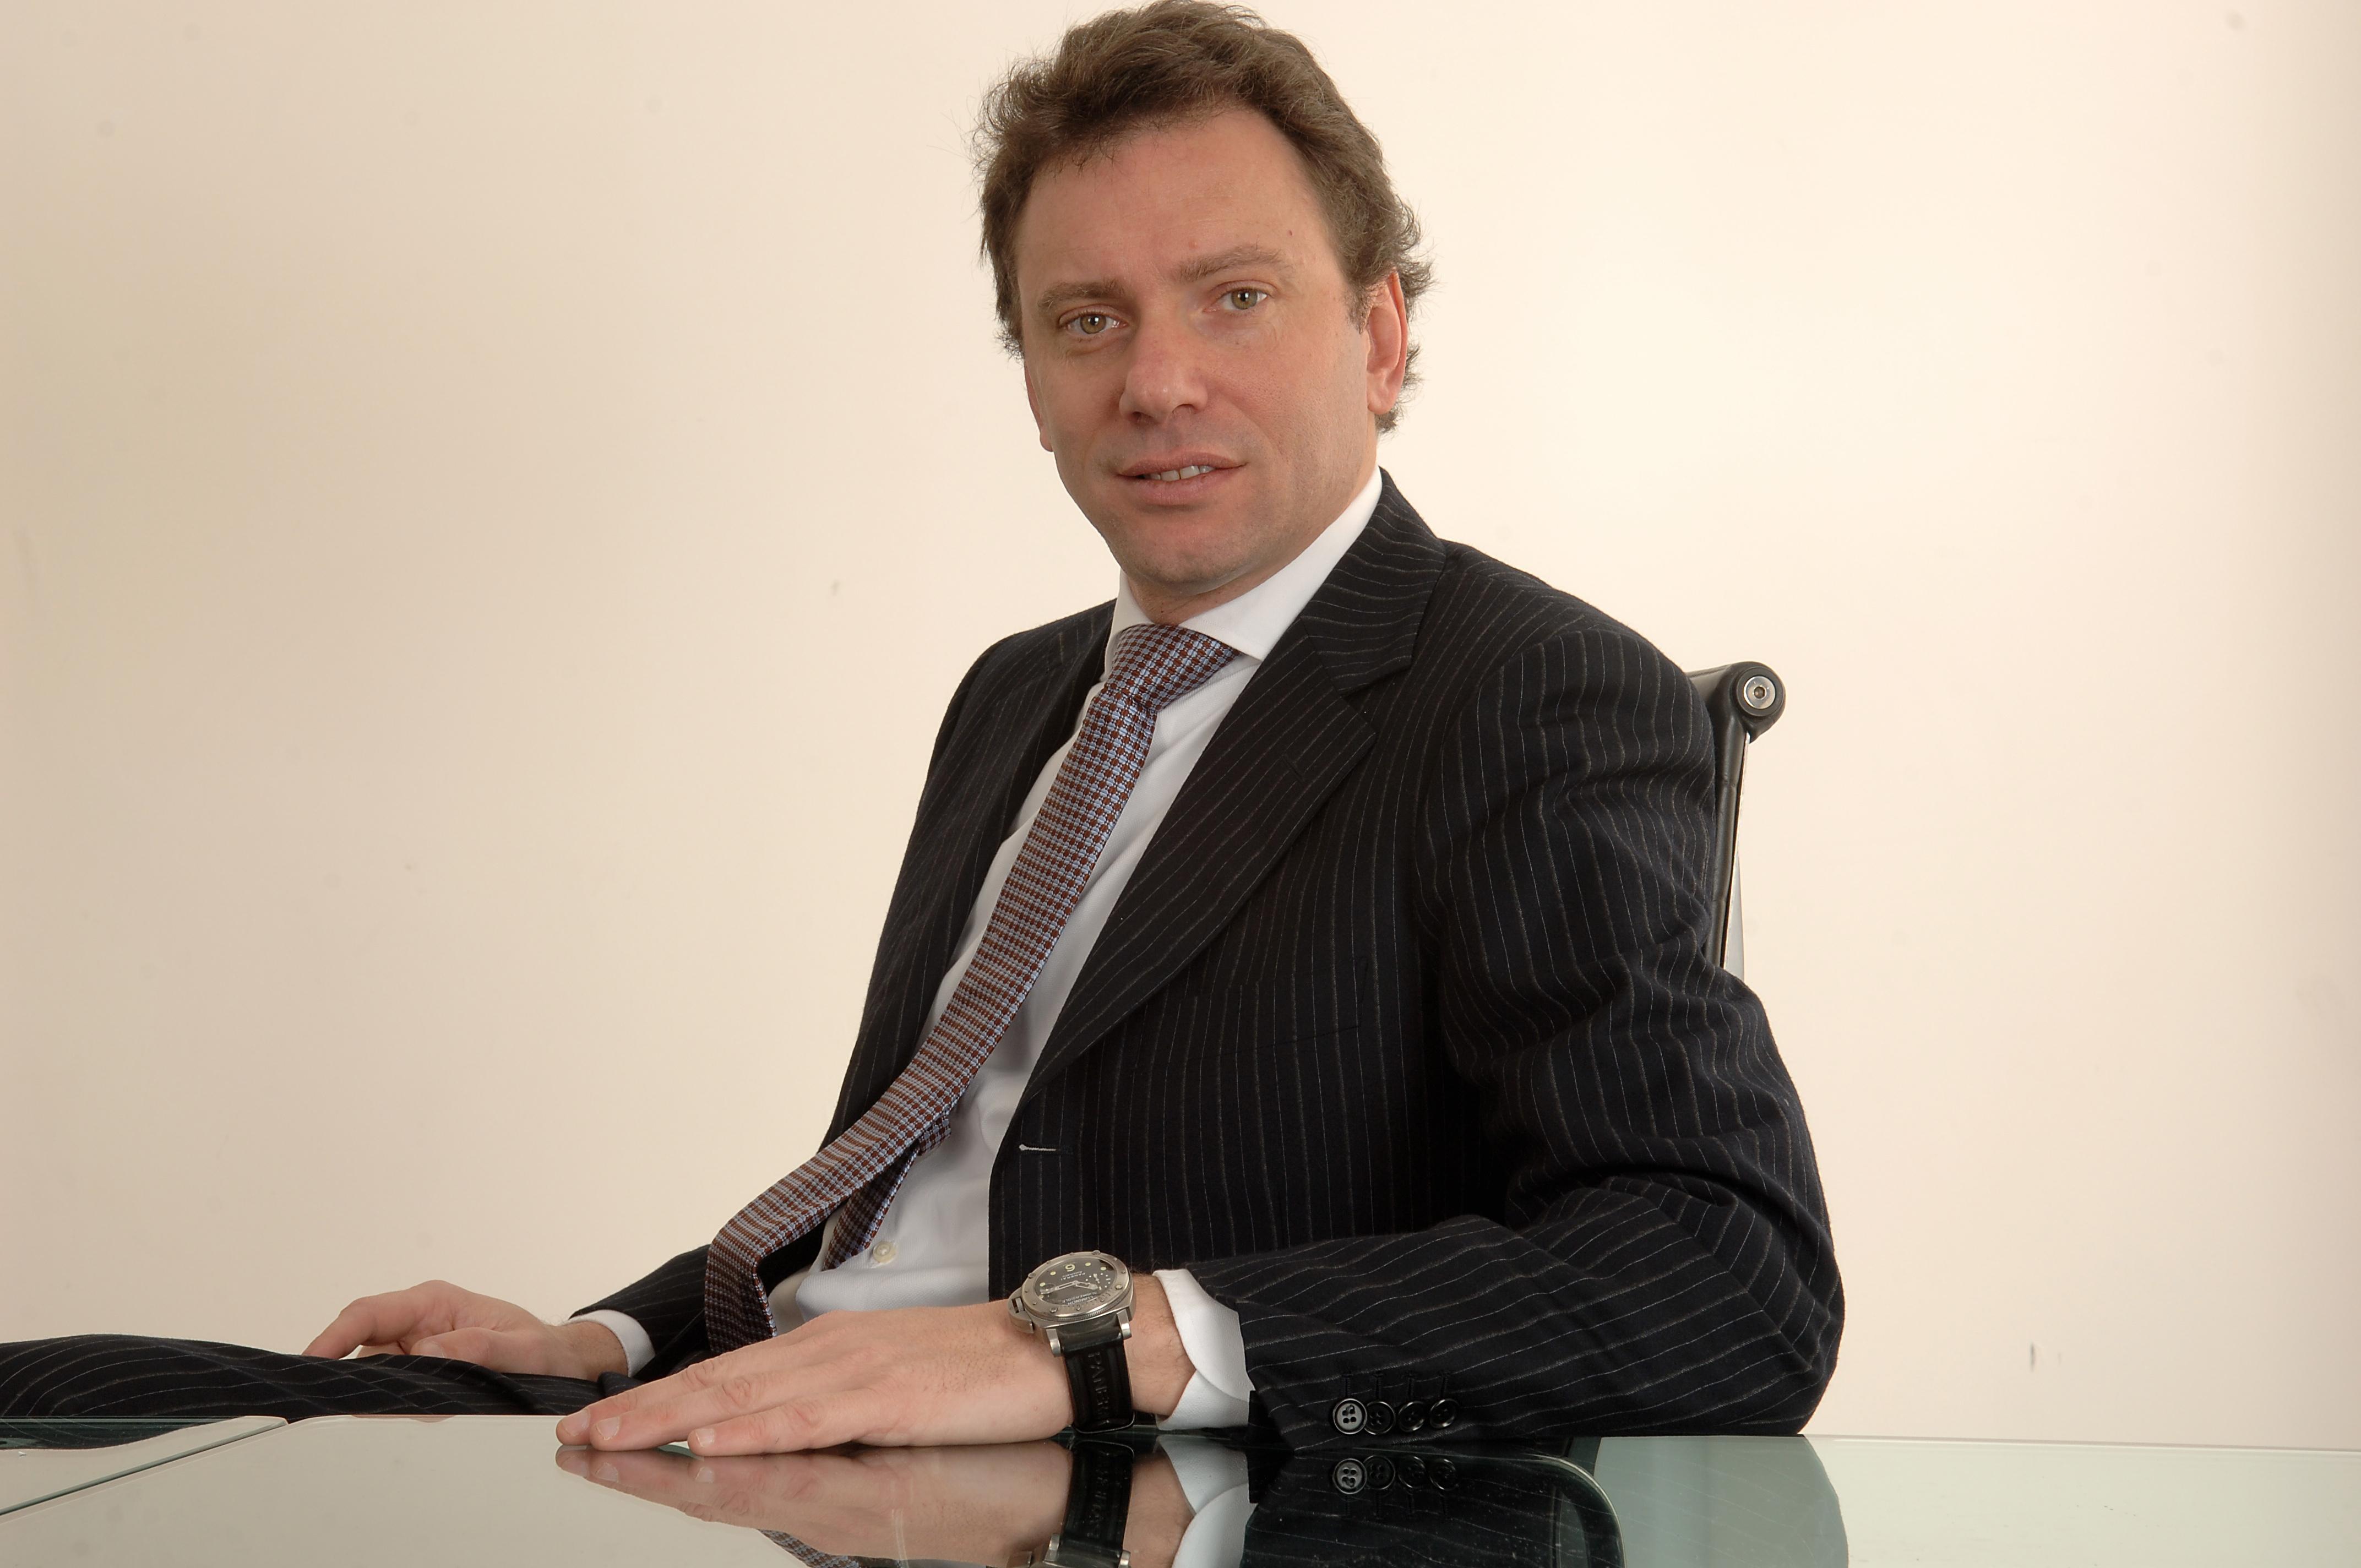 Claudio Campanini